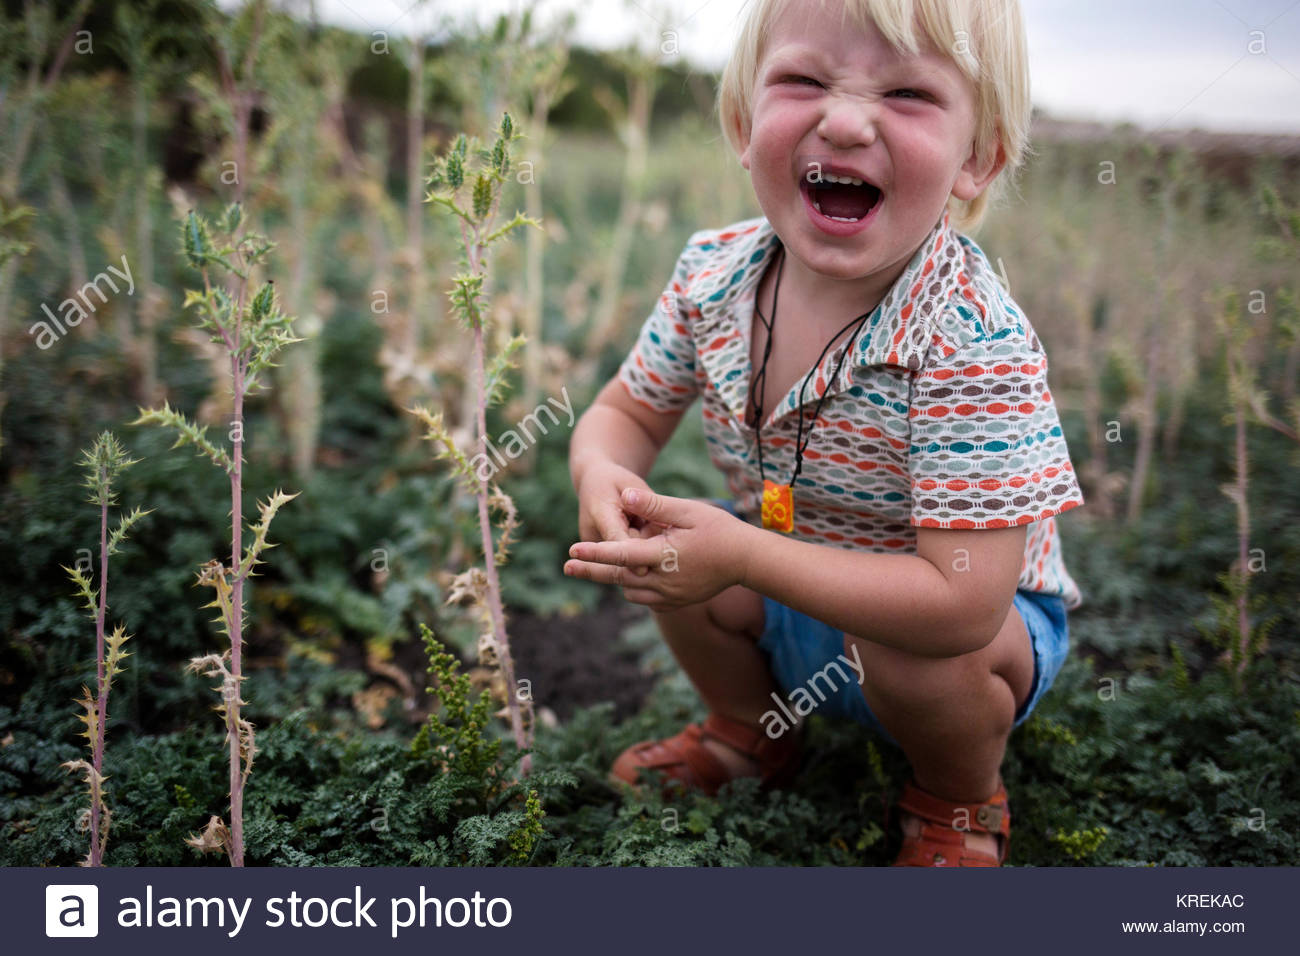 Laughing Caucasian boy crouching outdoors - Stock Image